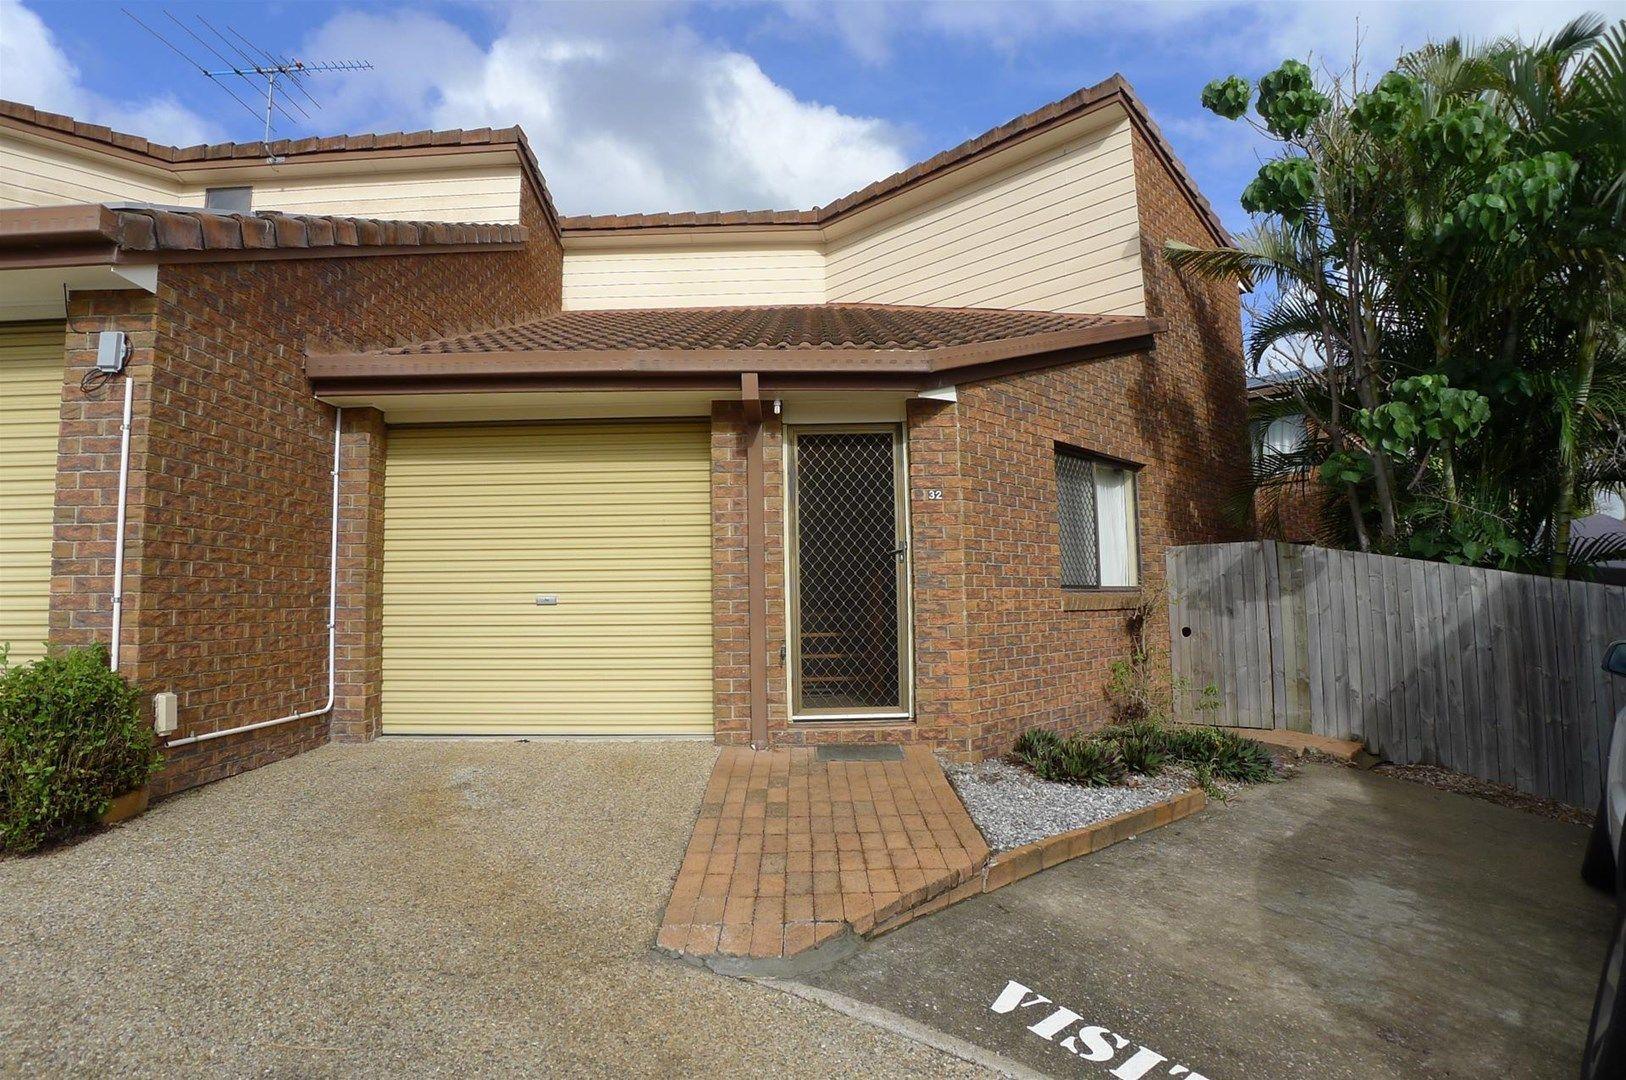 32/95 Barbaralla Drive, Springwood QLD 4127, Image 0